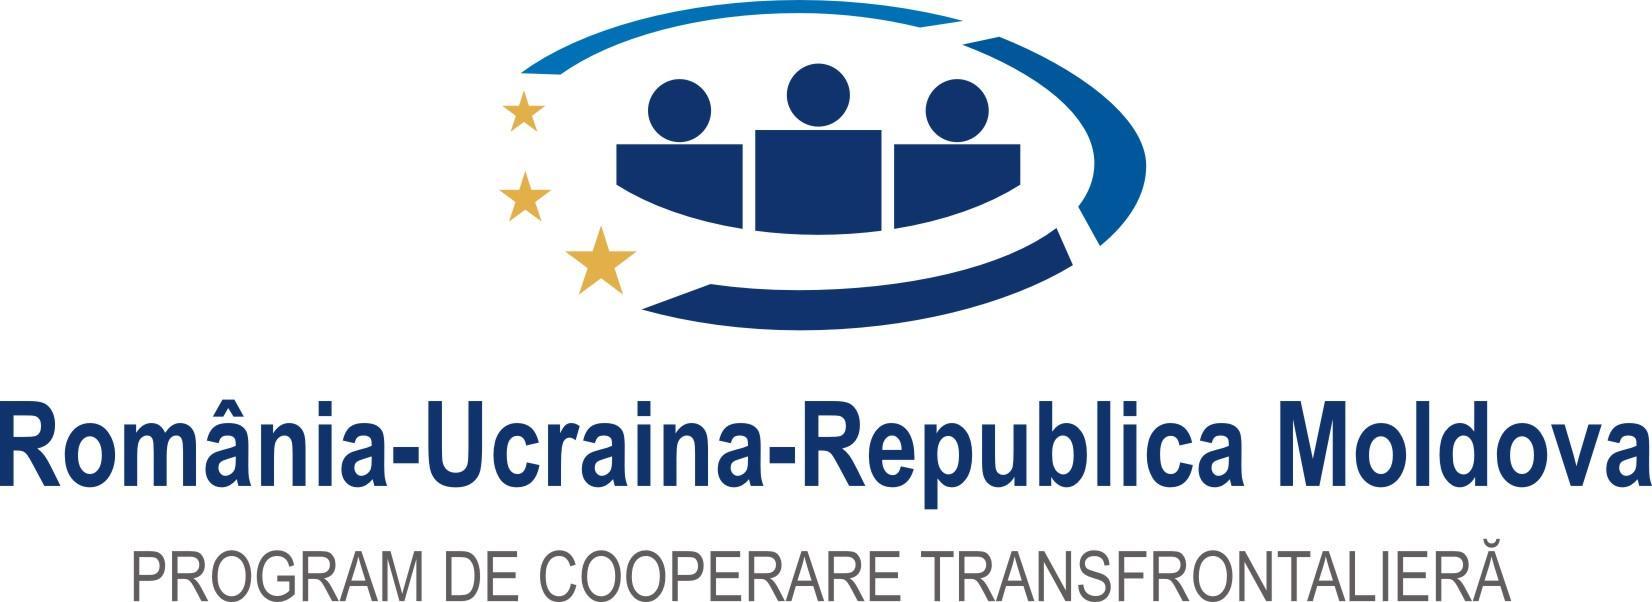 Bani europeni pentru Ucraina, Romania si Republica Moldova